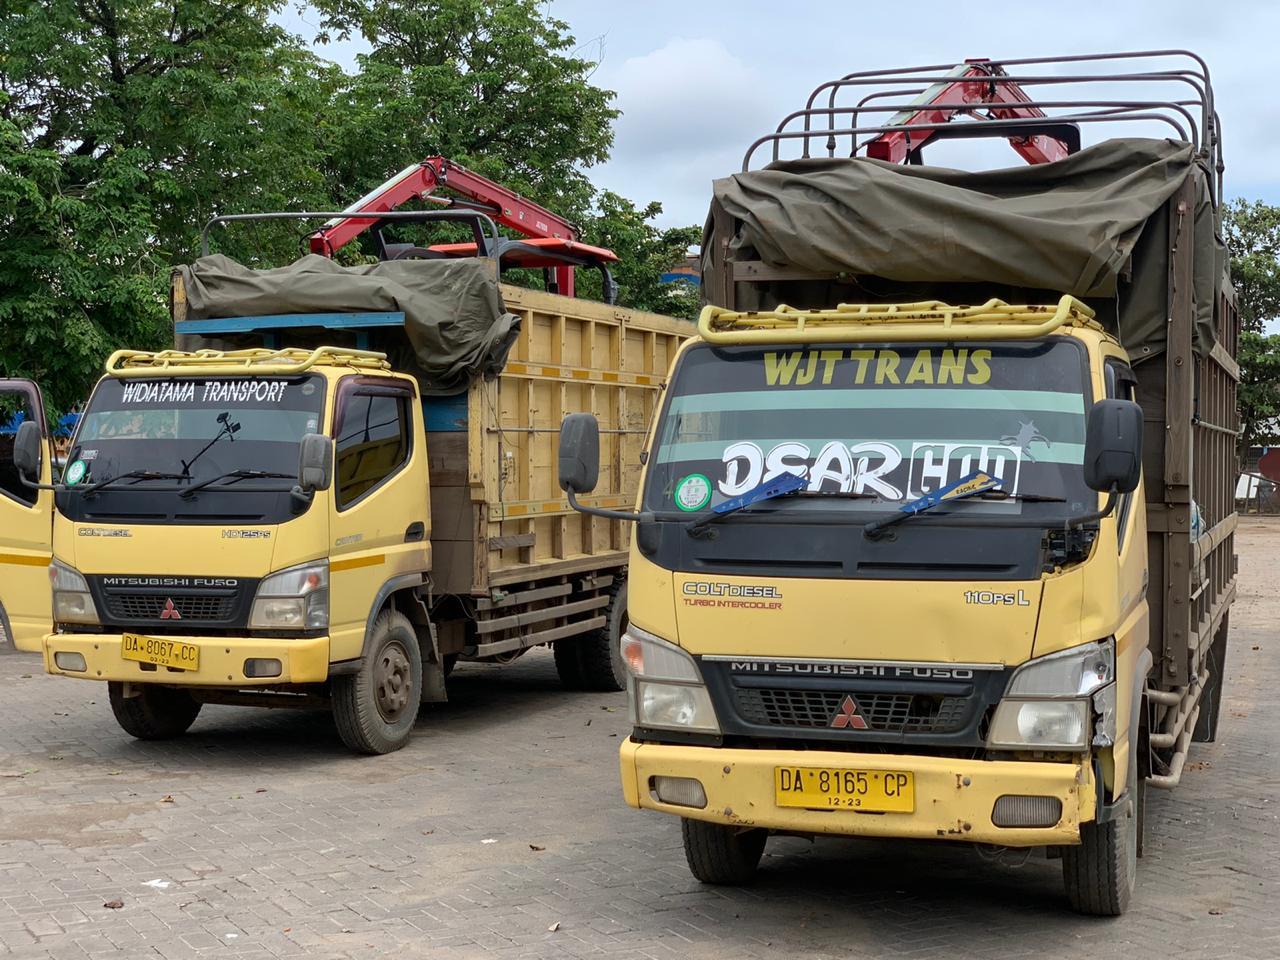 Pengiriman Sistem Kontrak - PT Widiatama Jaya Triputra